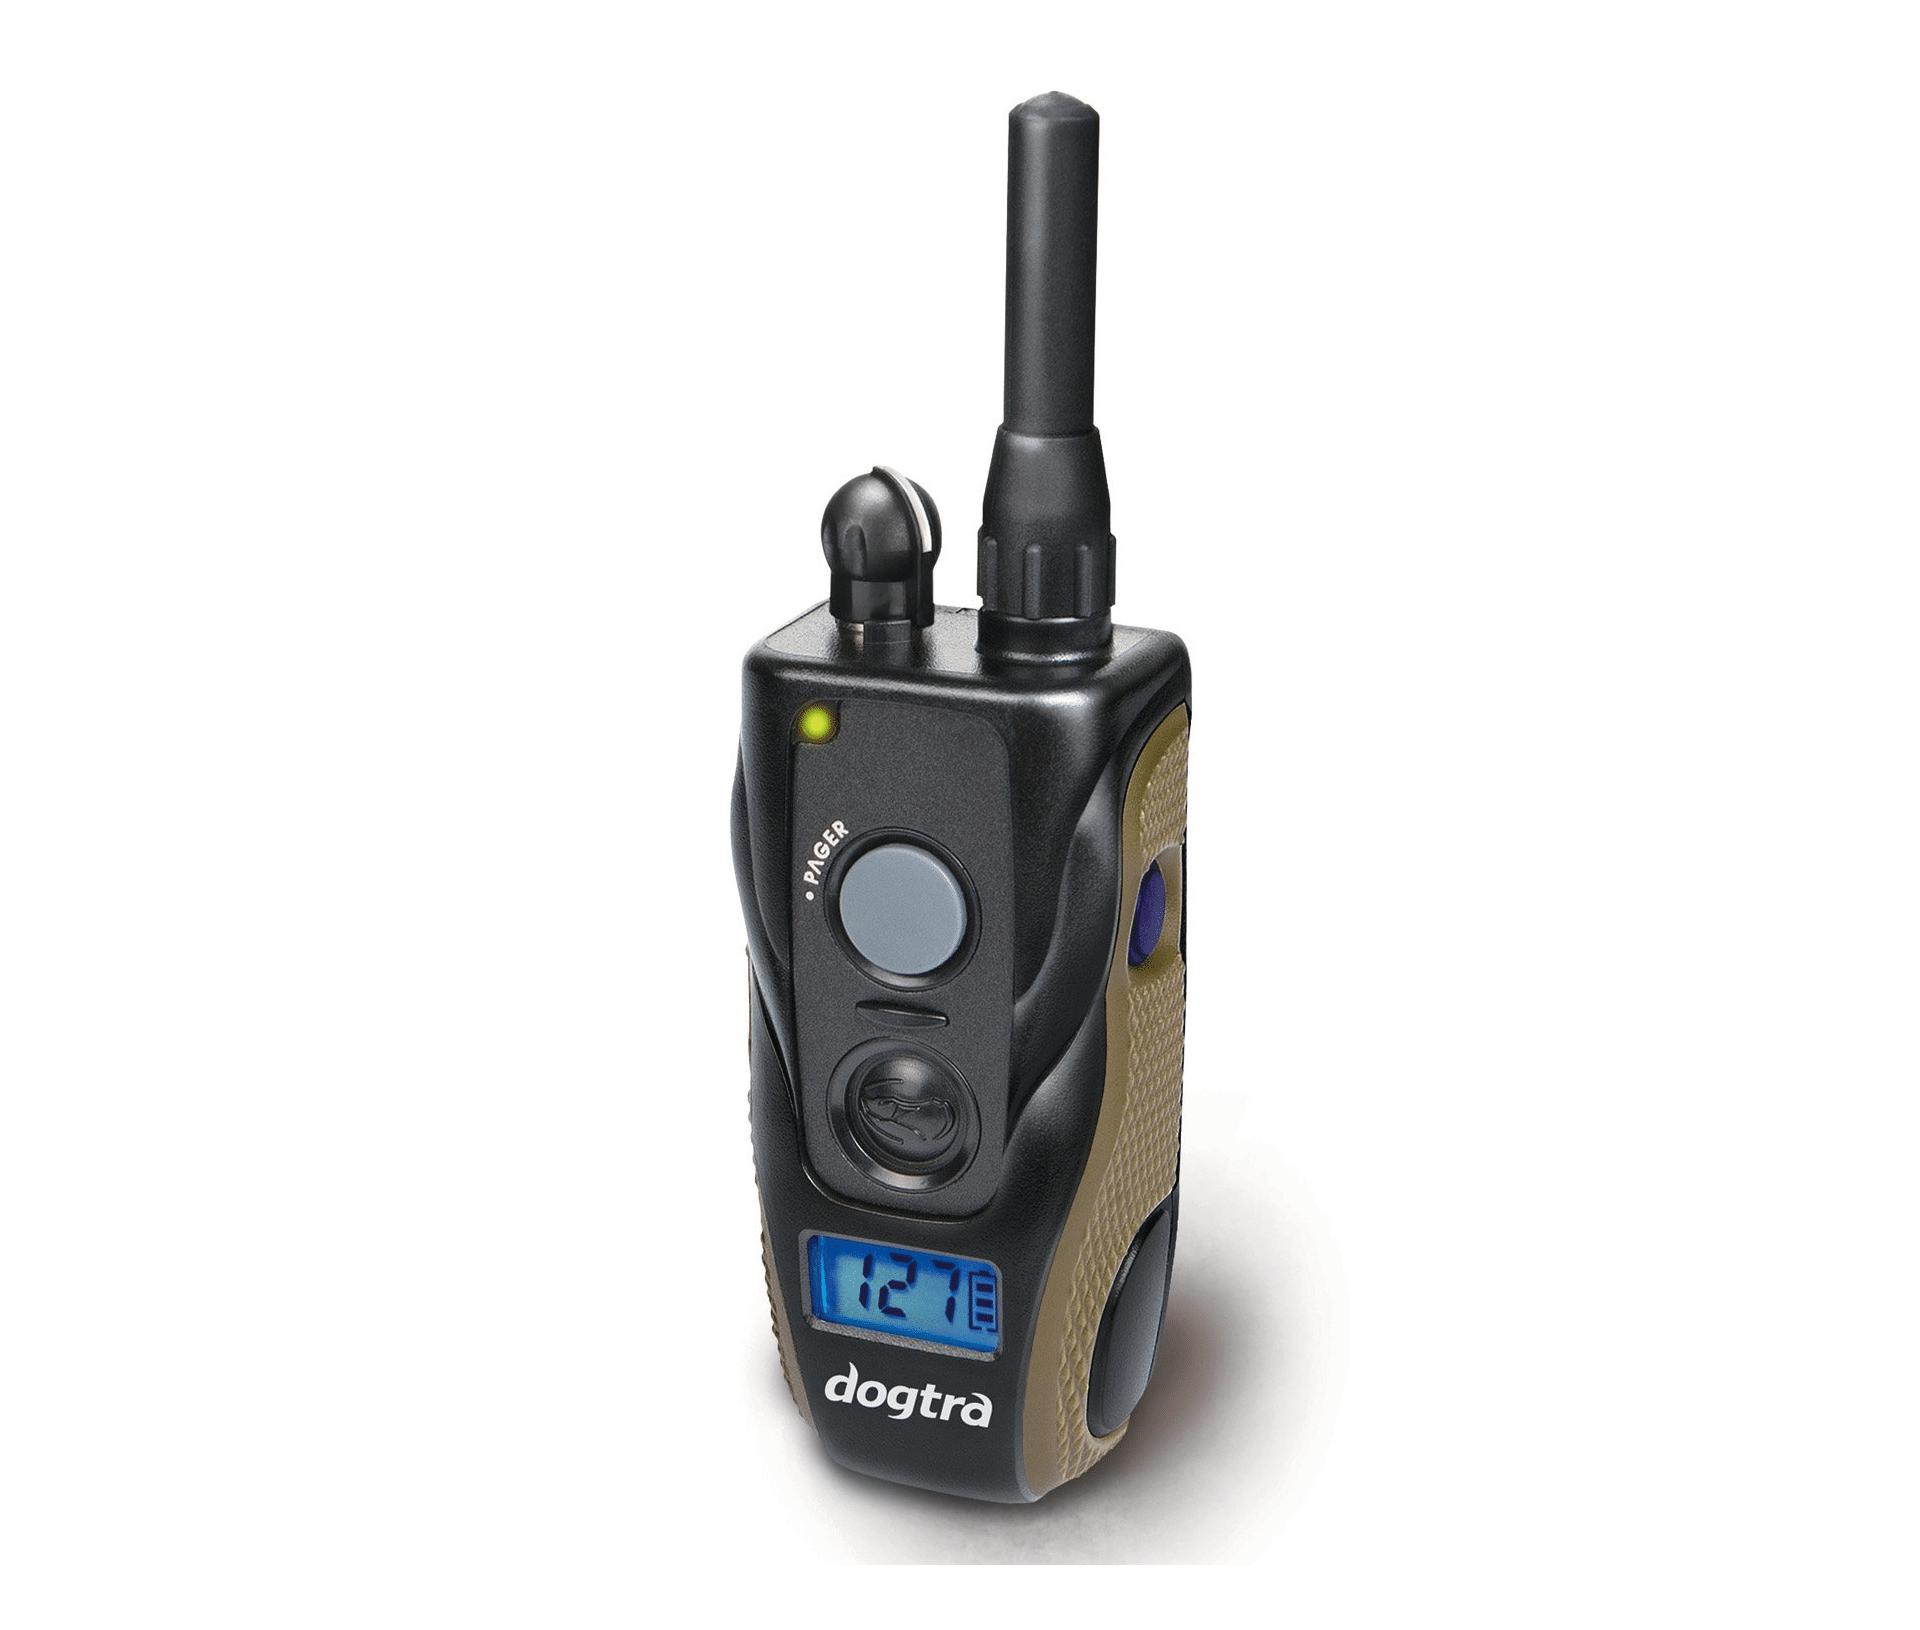 Dogtra 1902S Remote Training Collar